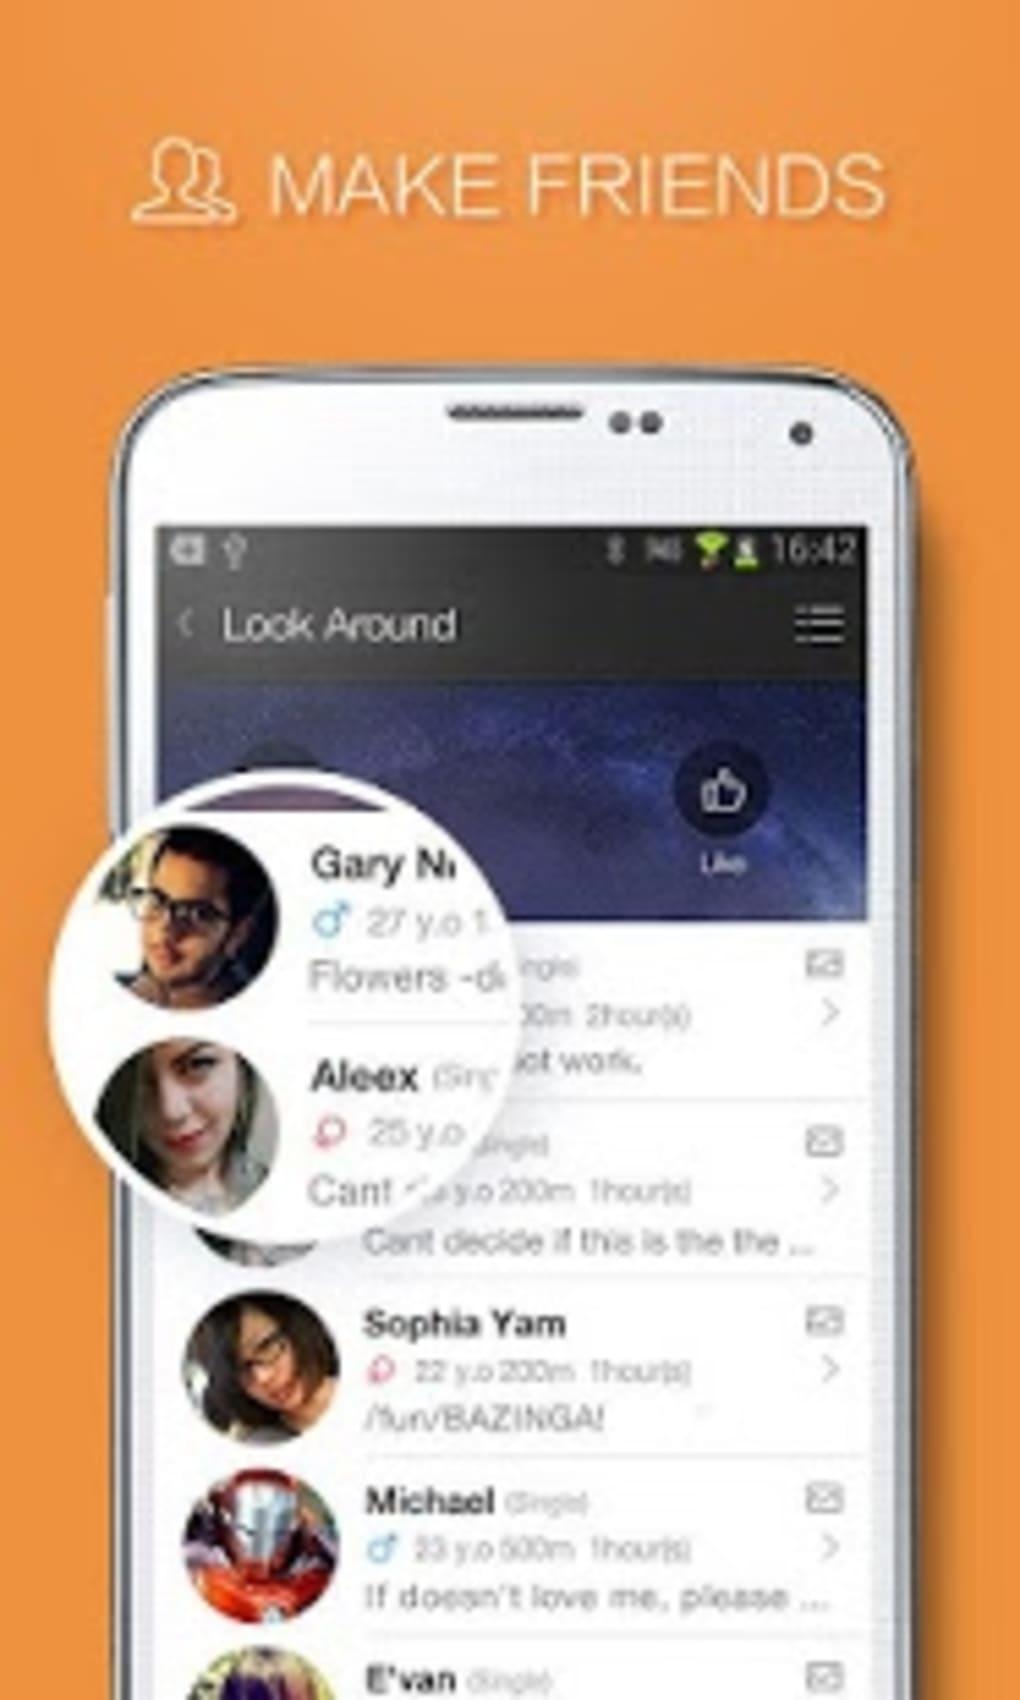 Qq messenger download.